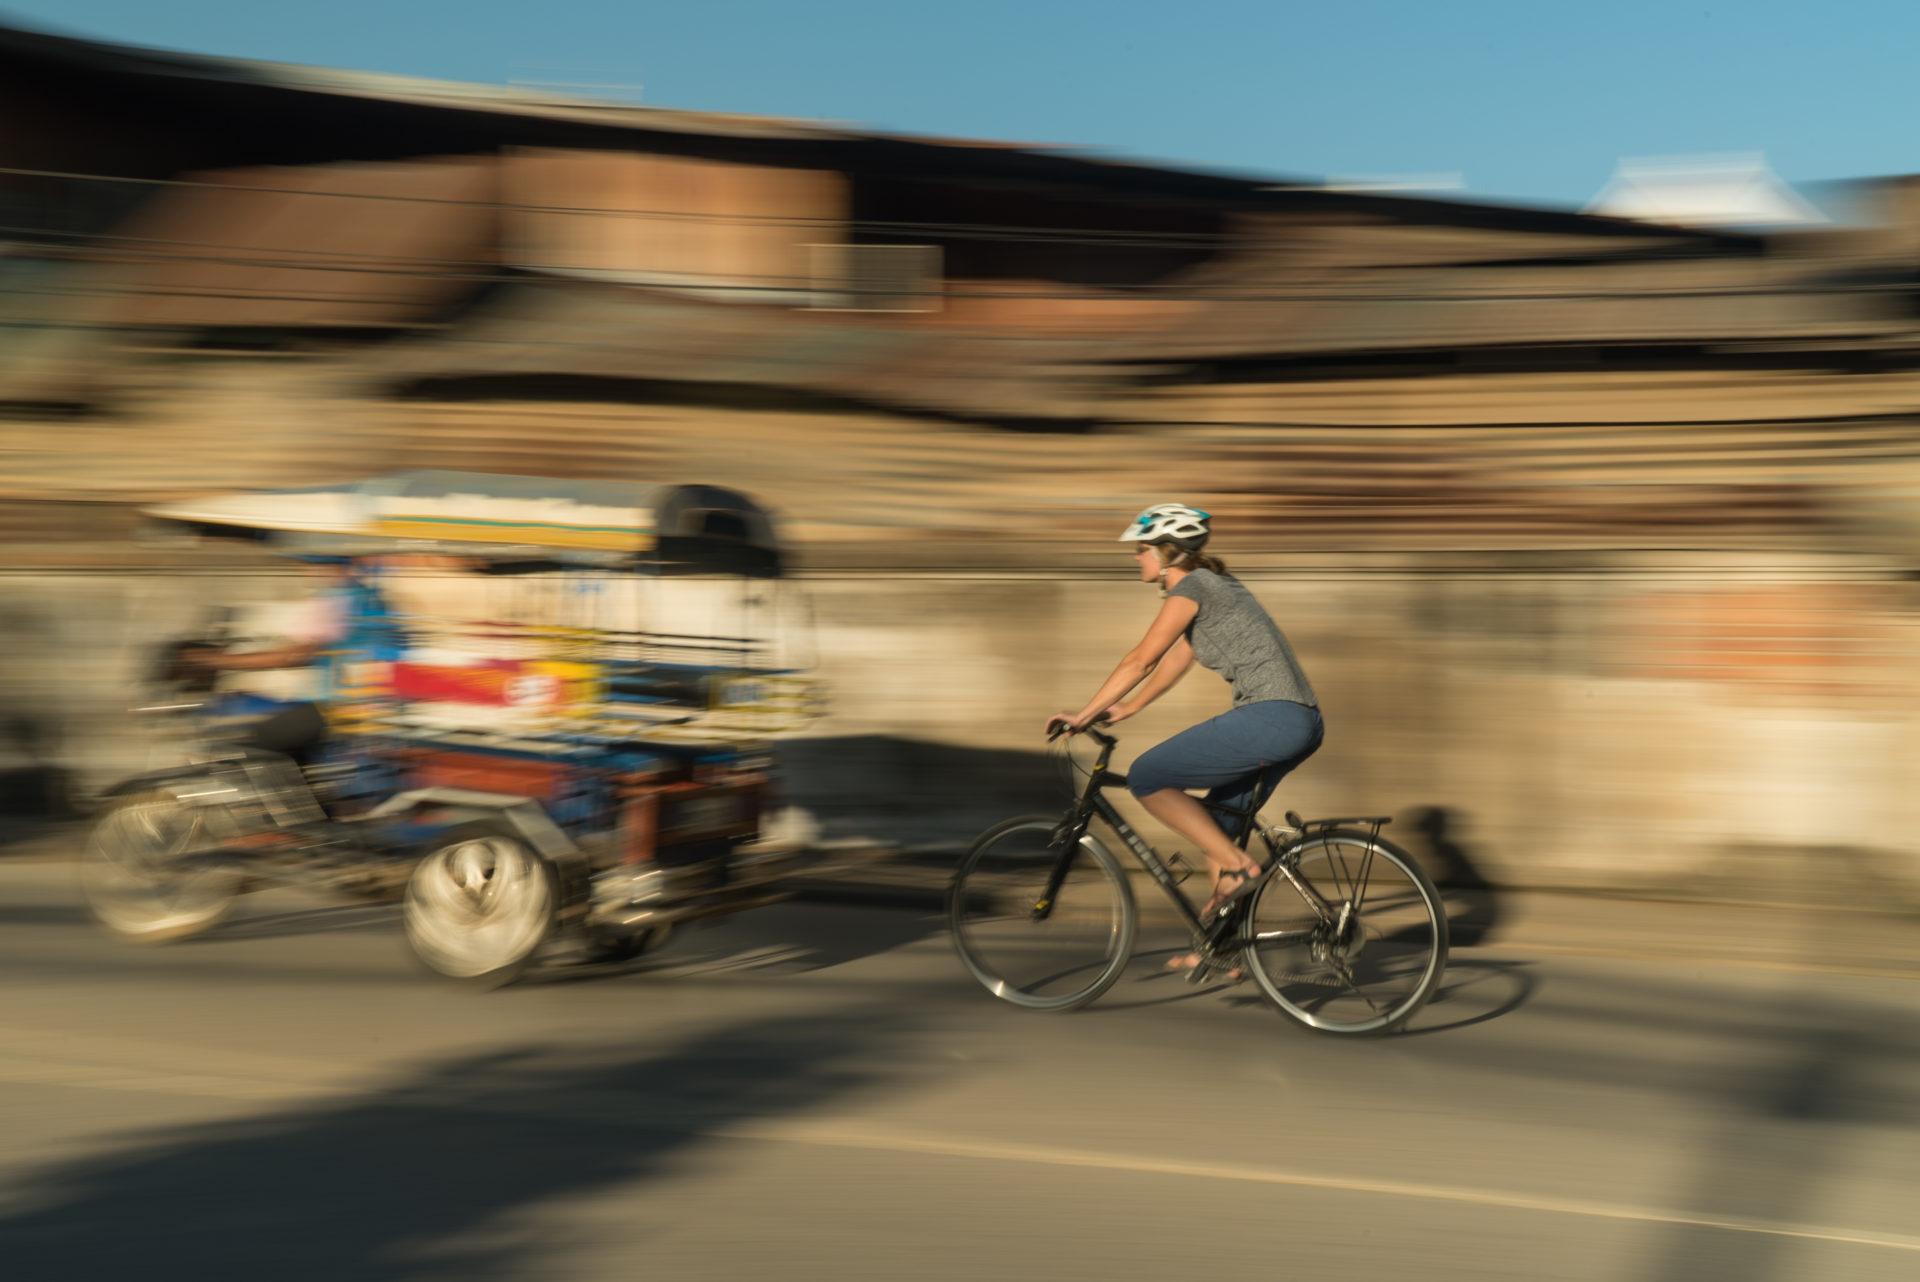 laos-cycling-biking-bike-ride-luang-prabang-city-tuk-tuk-taxi-southeast-asia-travel-adventure